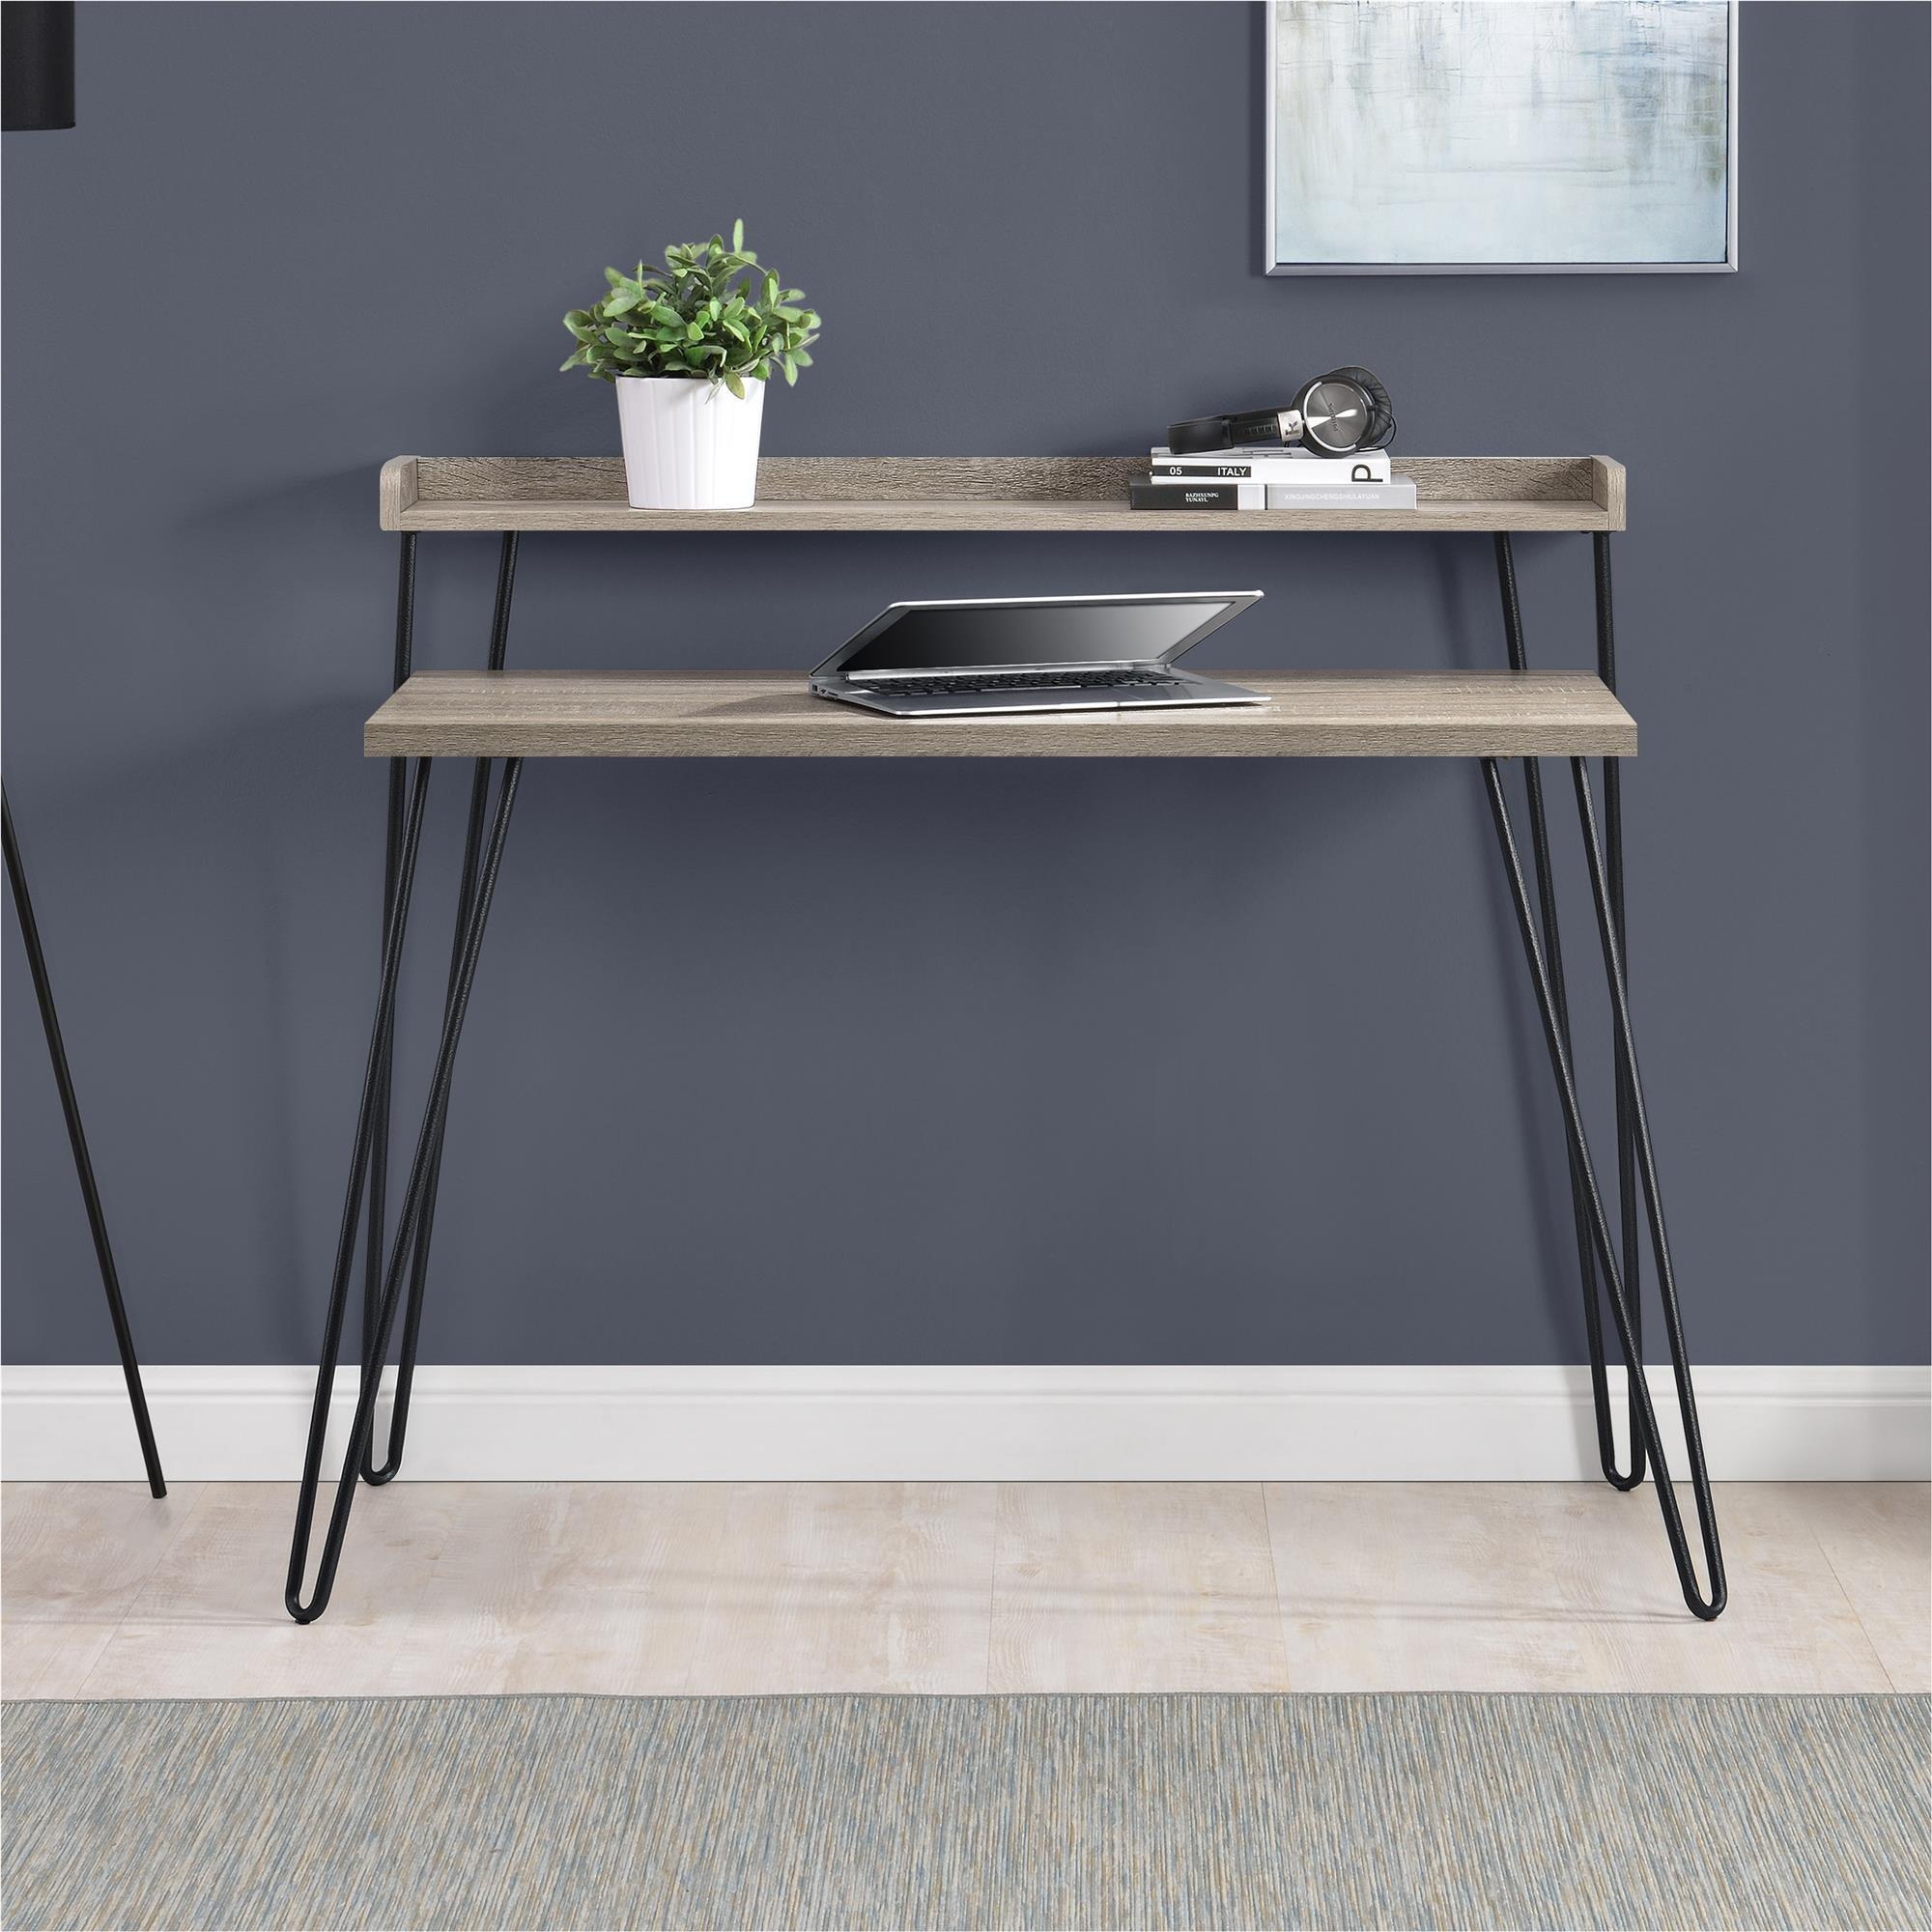 Ameriwood Home Haven Retro Desk Riser, Weathered Oak by Ameriwood Home (Image #3)